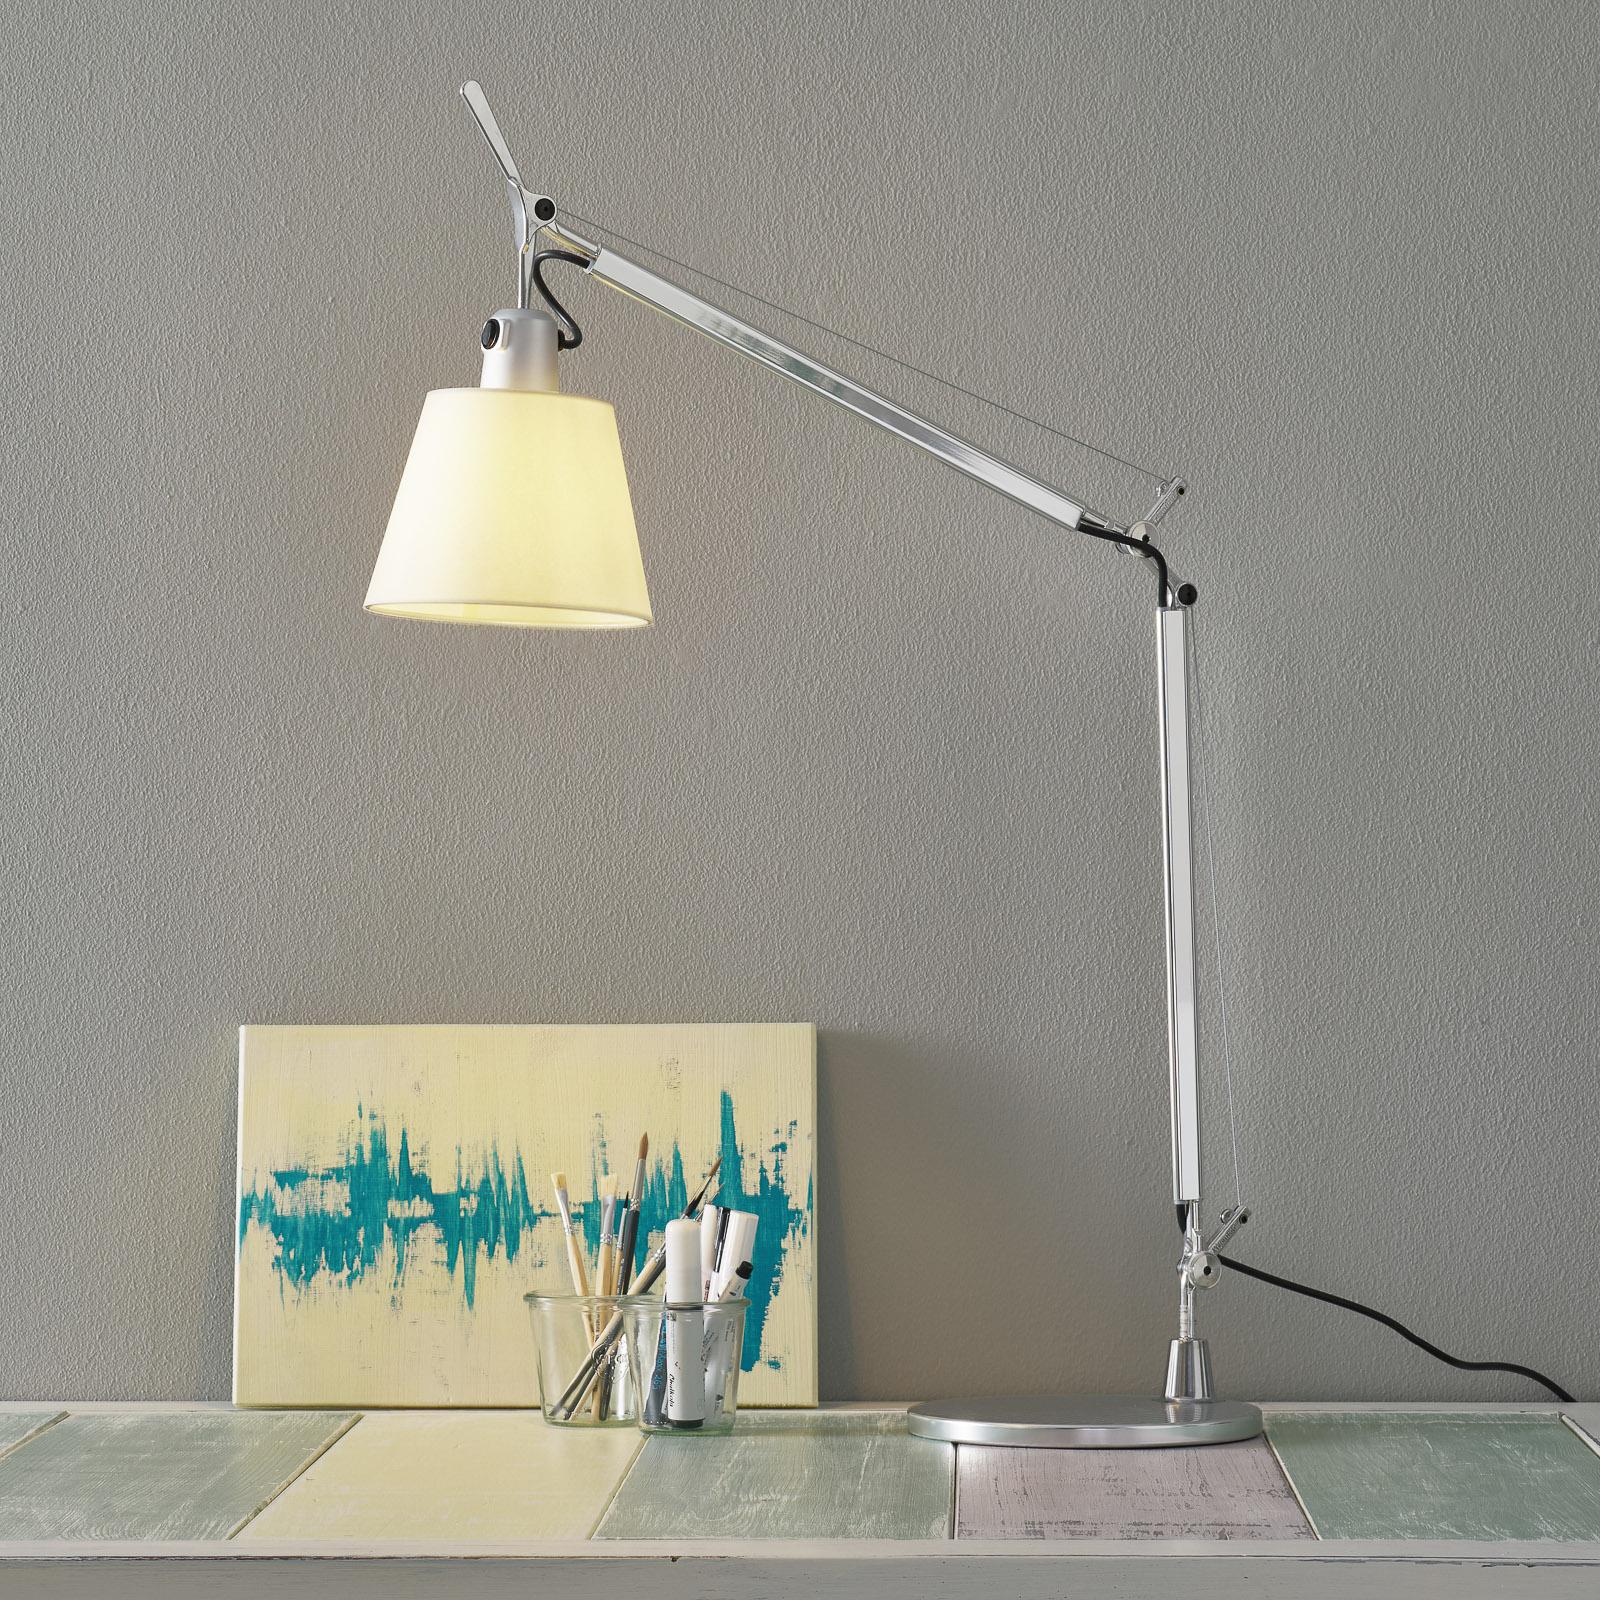 Lampe à poser de designer Tolomeo Basculante